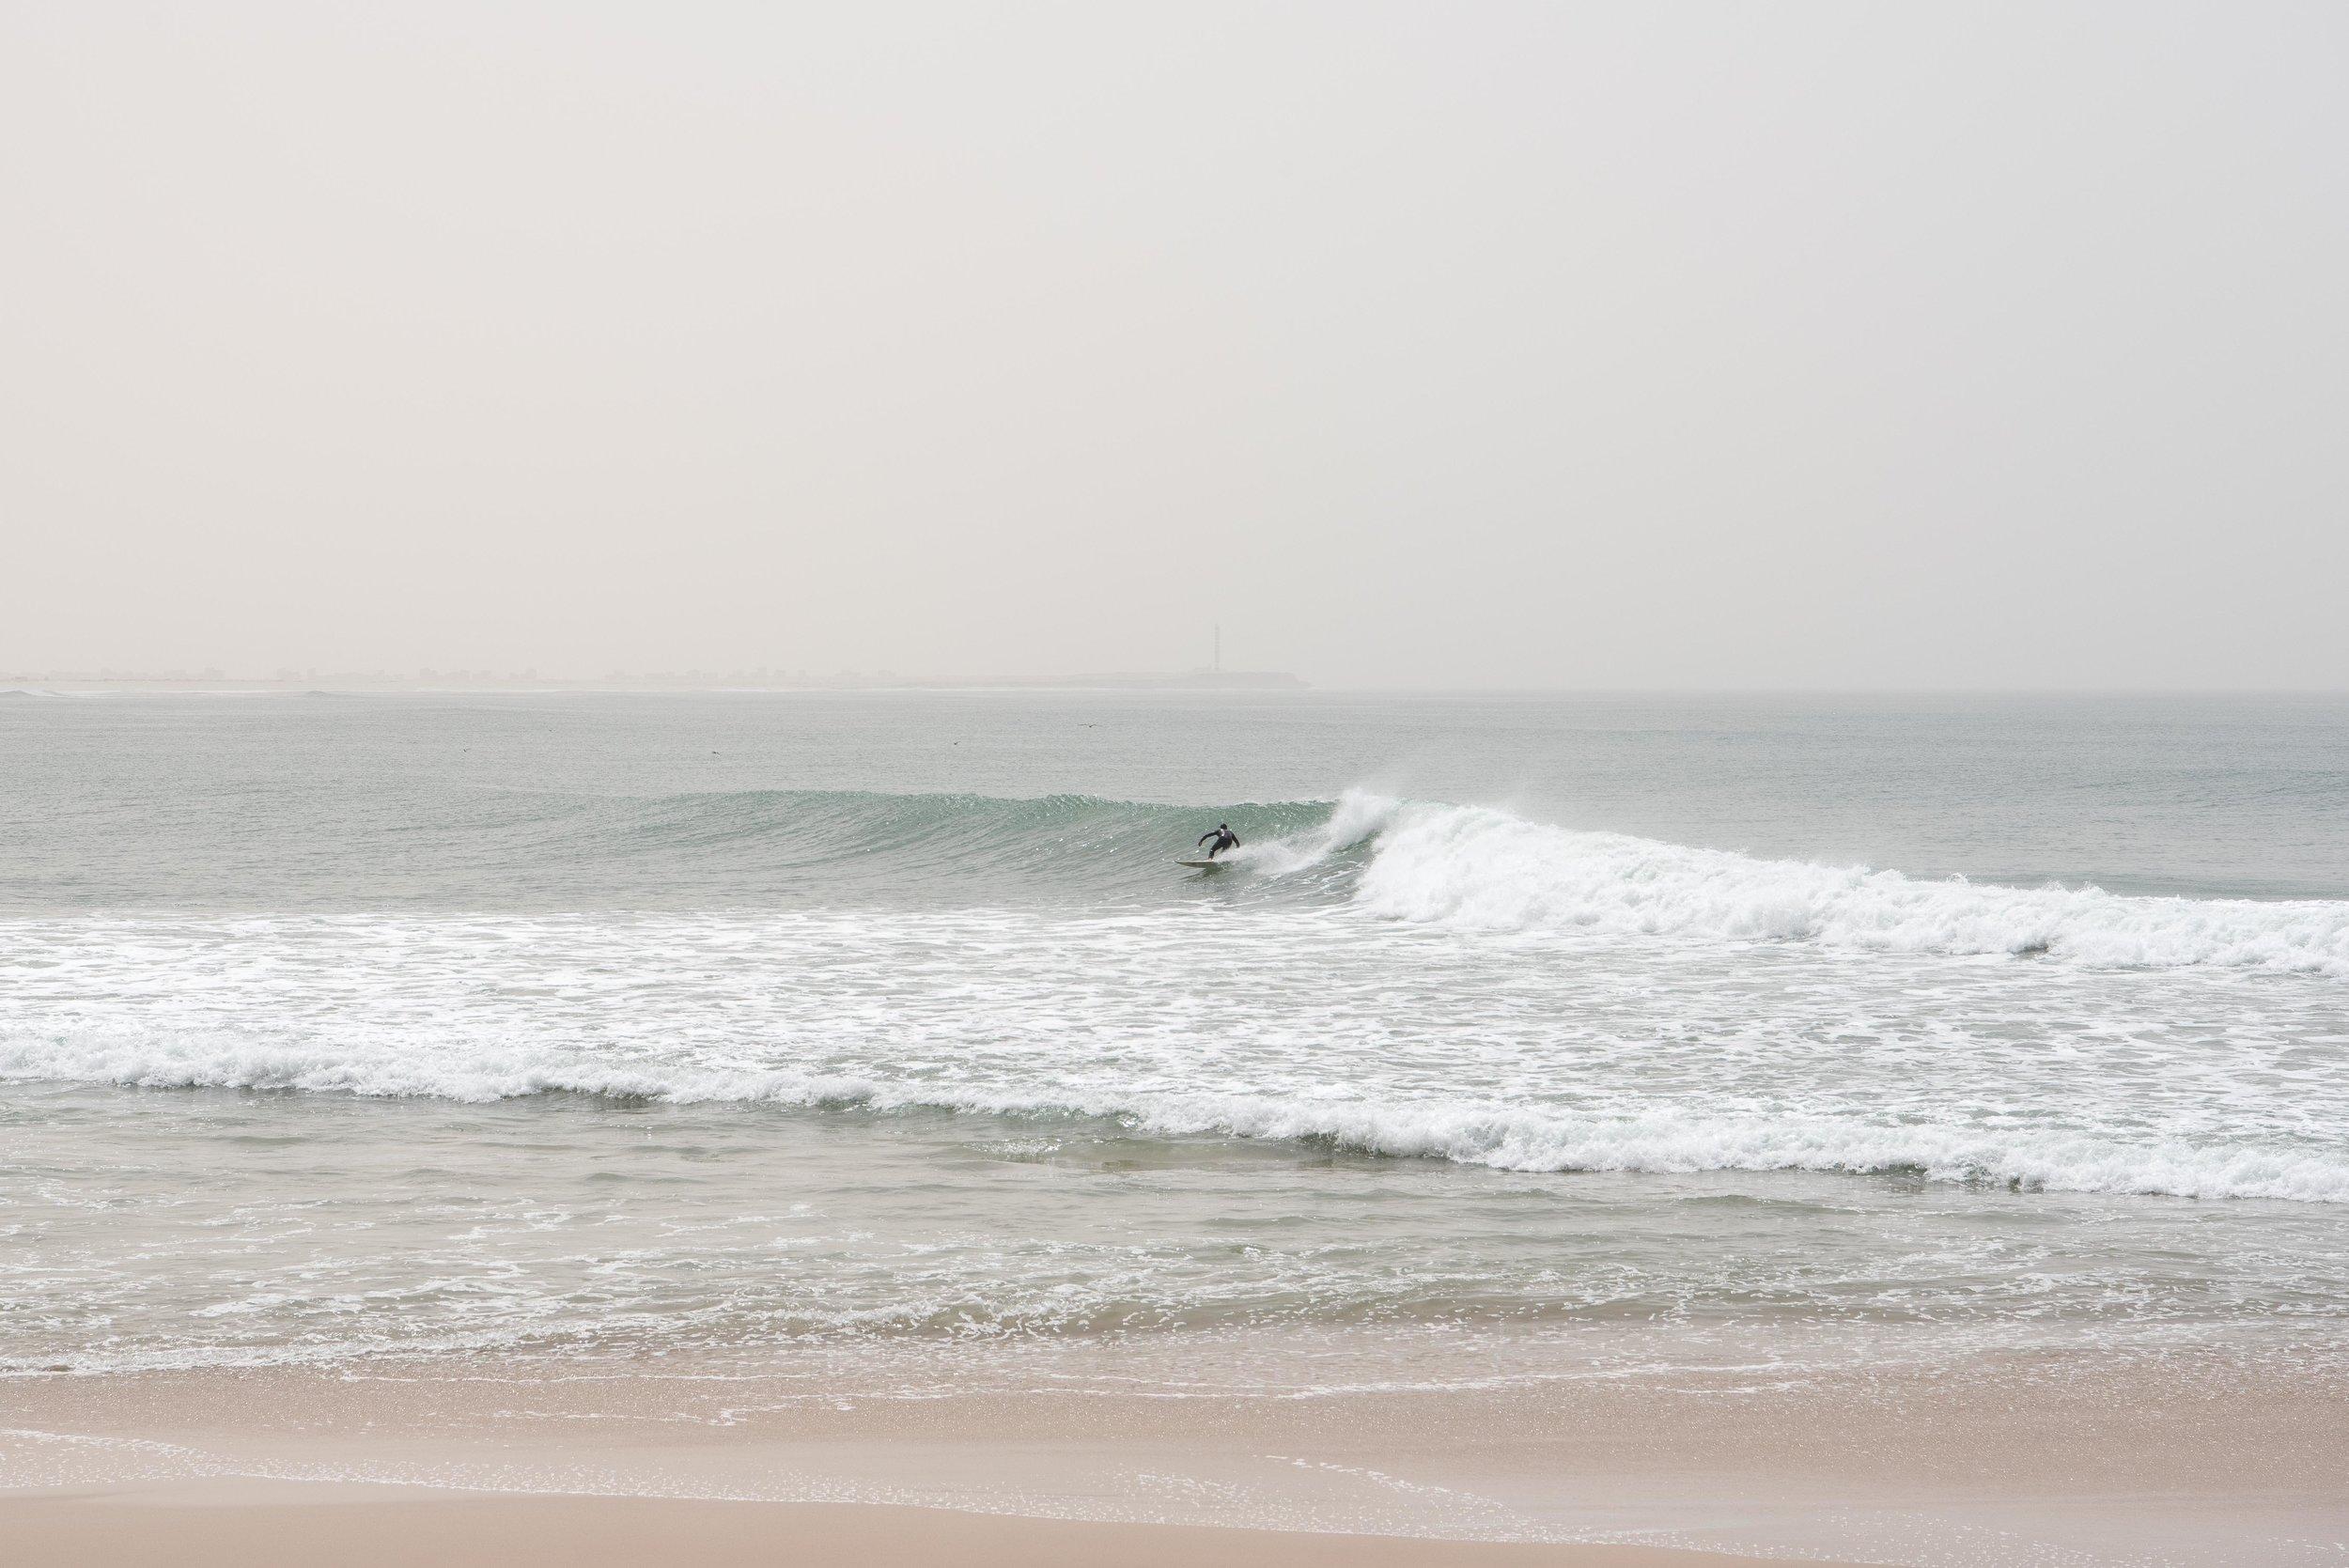 Foum El Bouir, the surfspot.